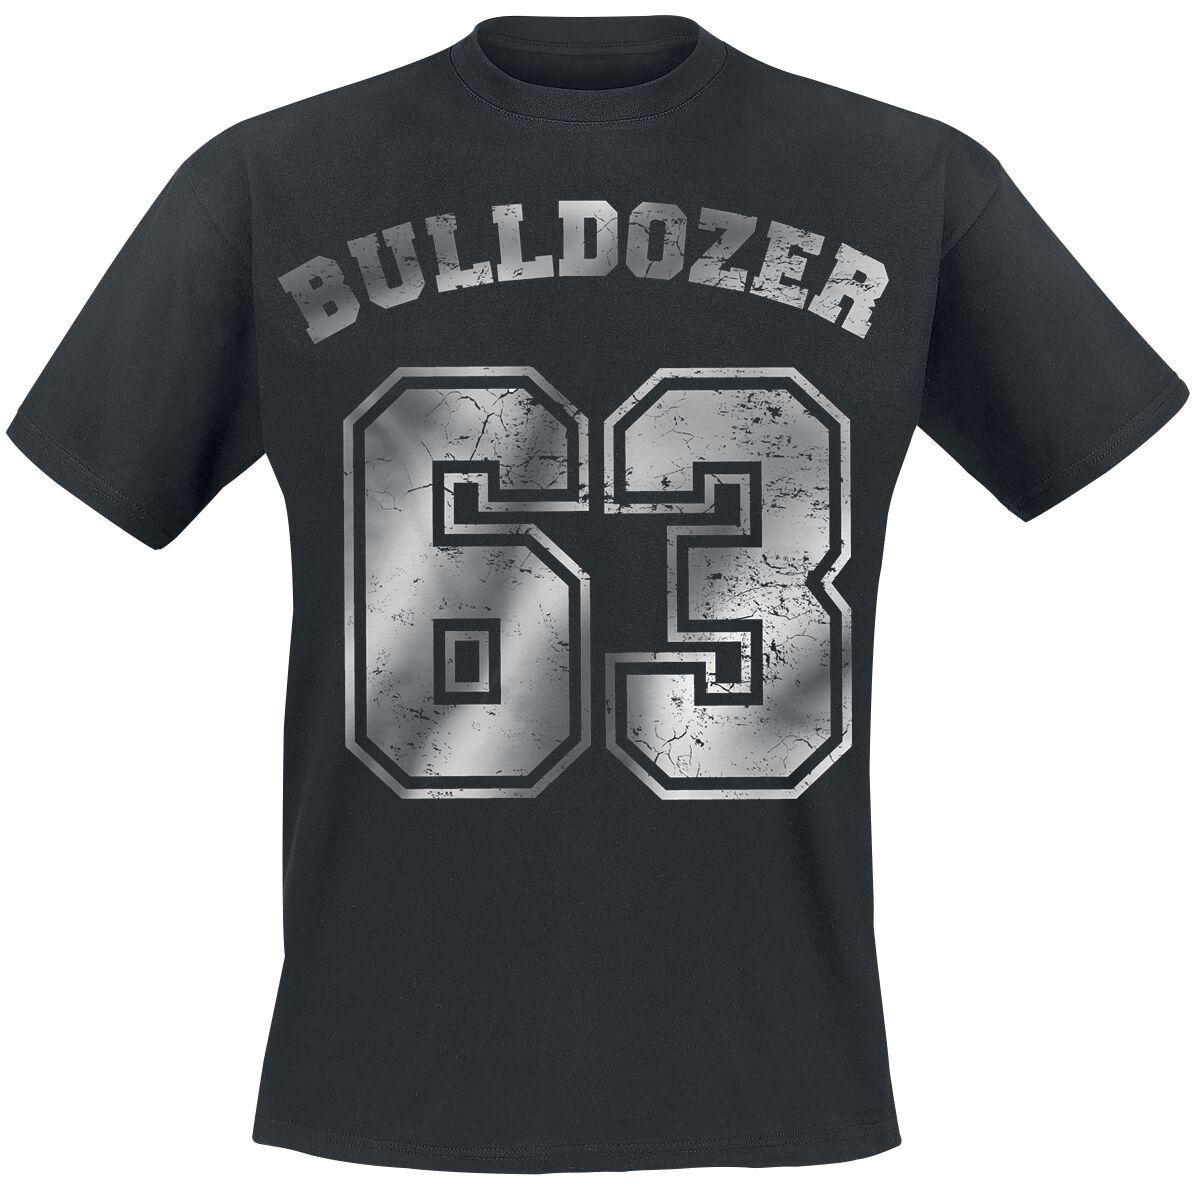 Merch dla Fanów - Koszulki - T-Shirt Bud Spencer Bulldozer T-Shirt czarny - 362245